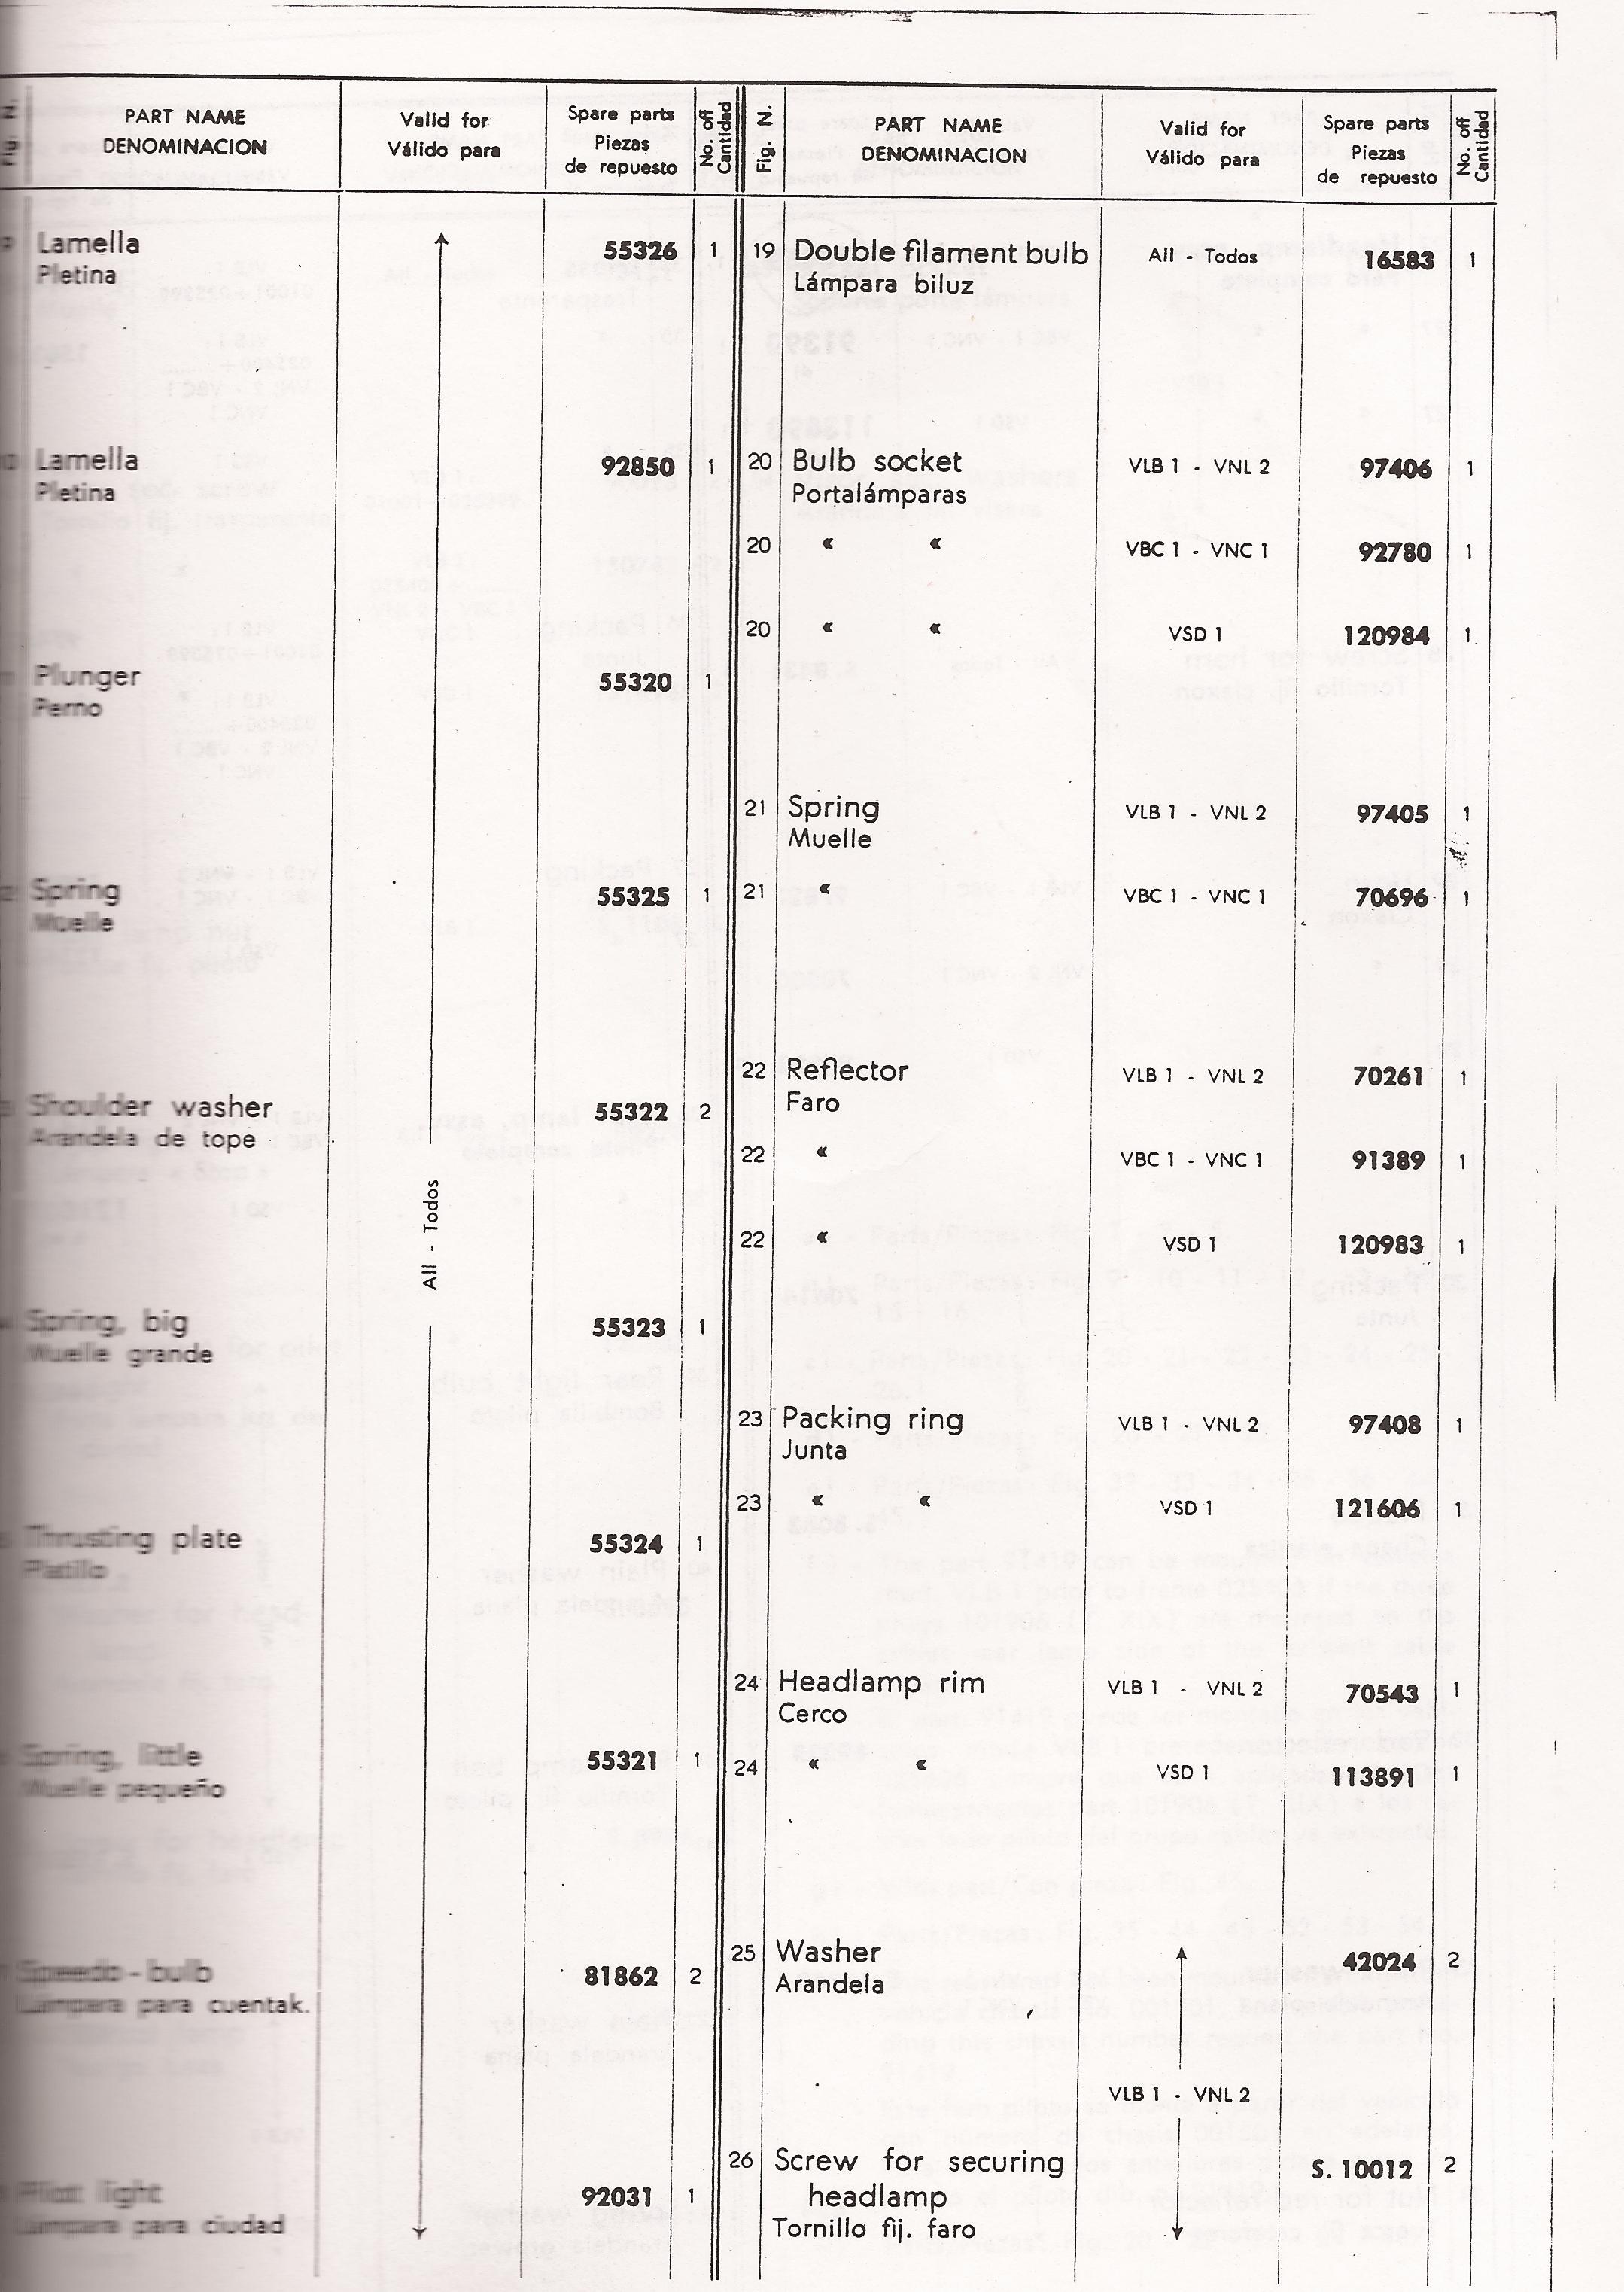 02-25-2013 vespa manaul 64.jpg